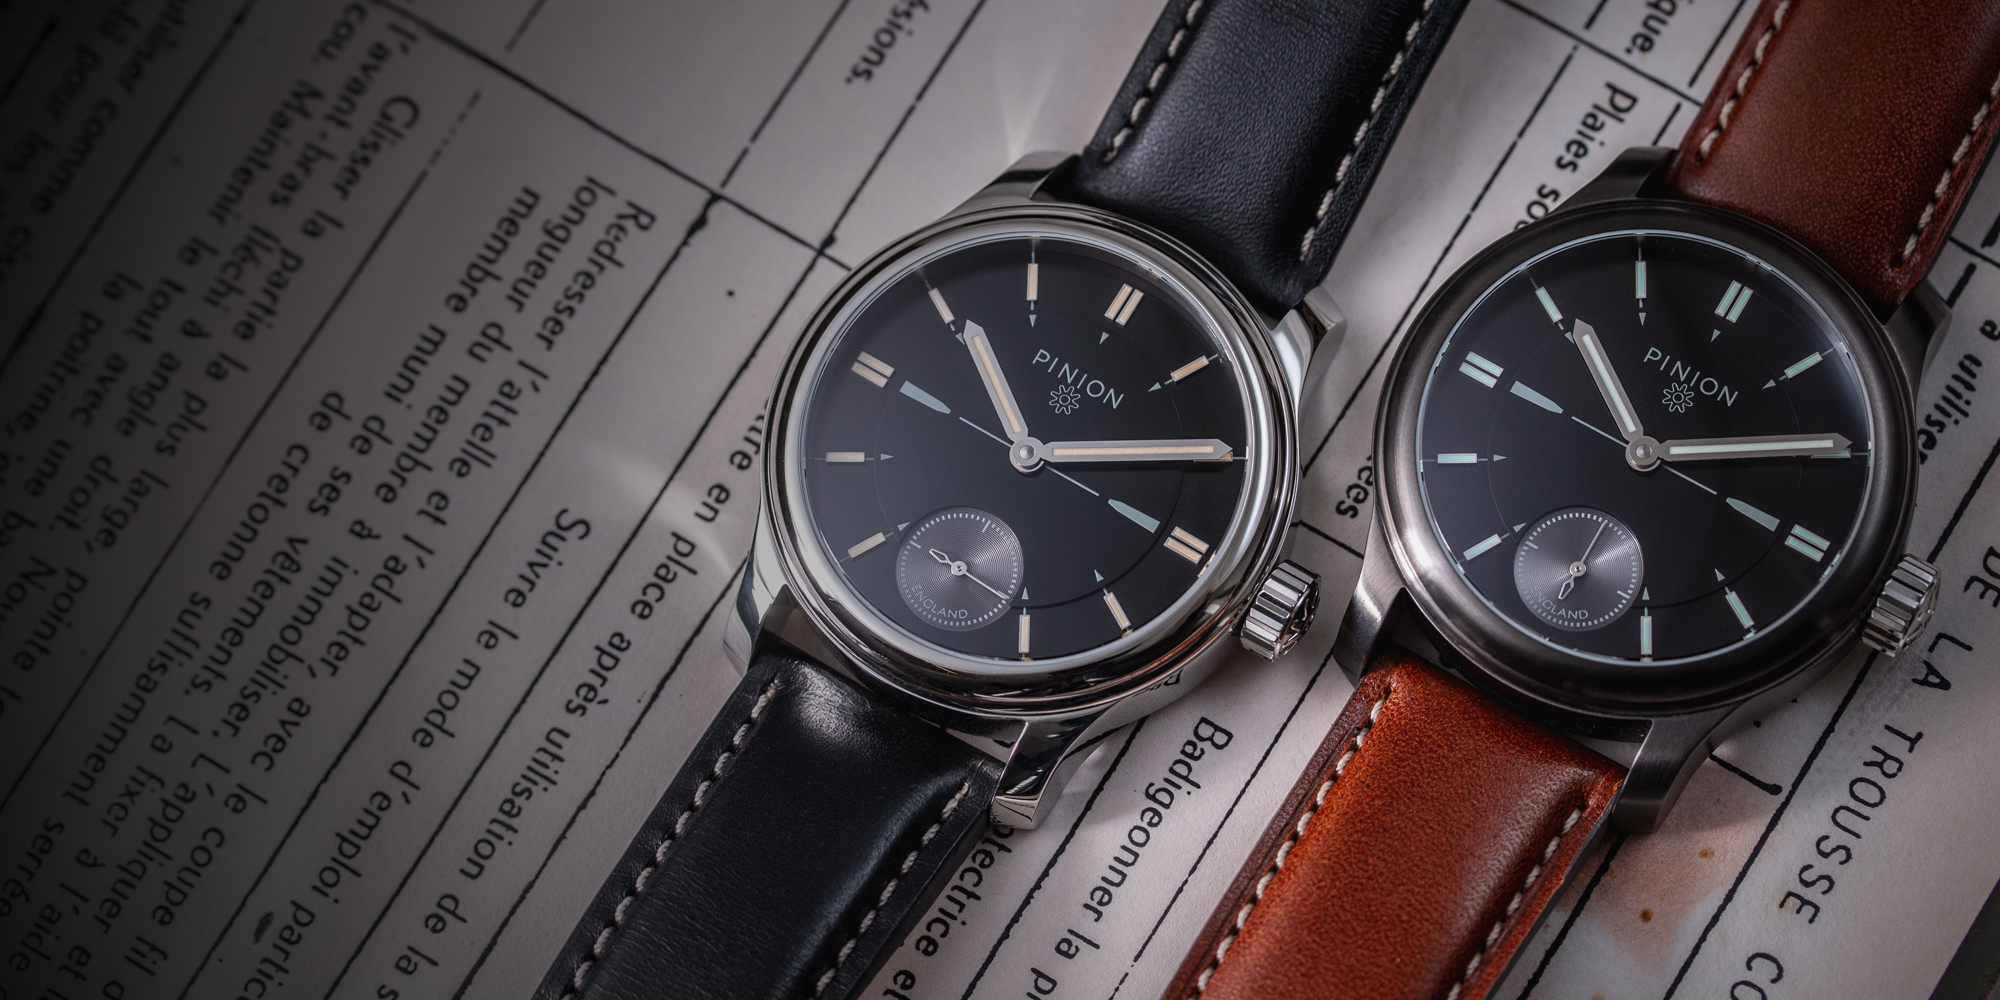 pinion-pure-pro-handwound-watches